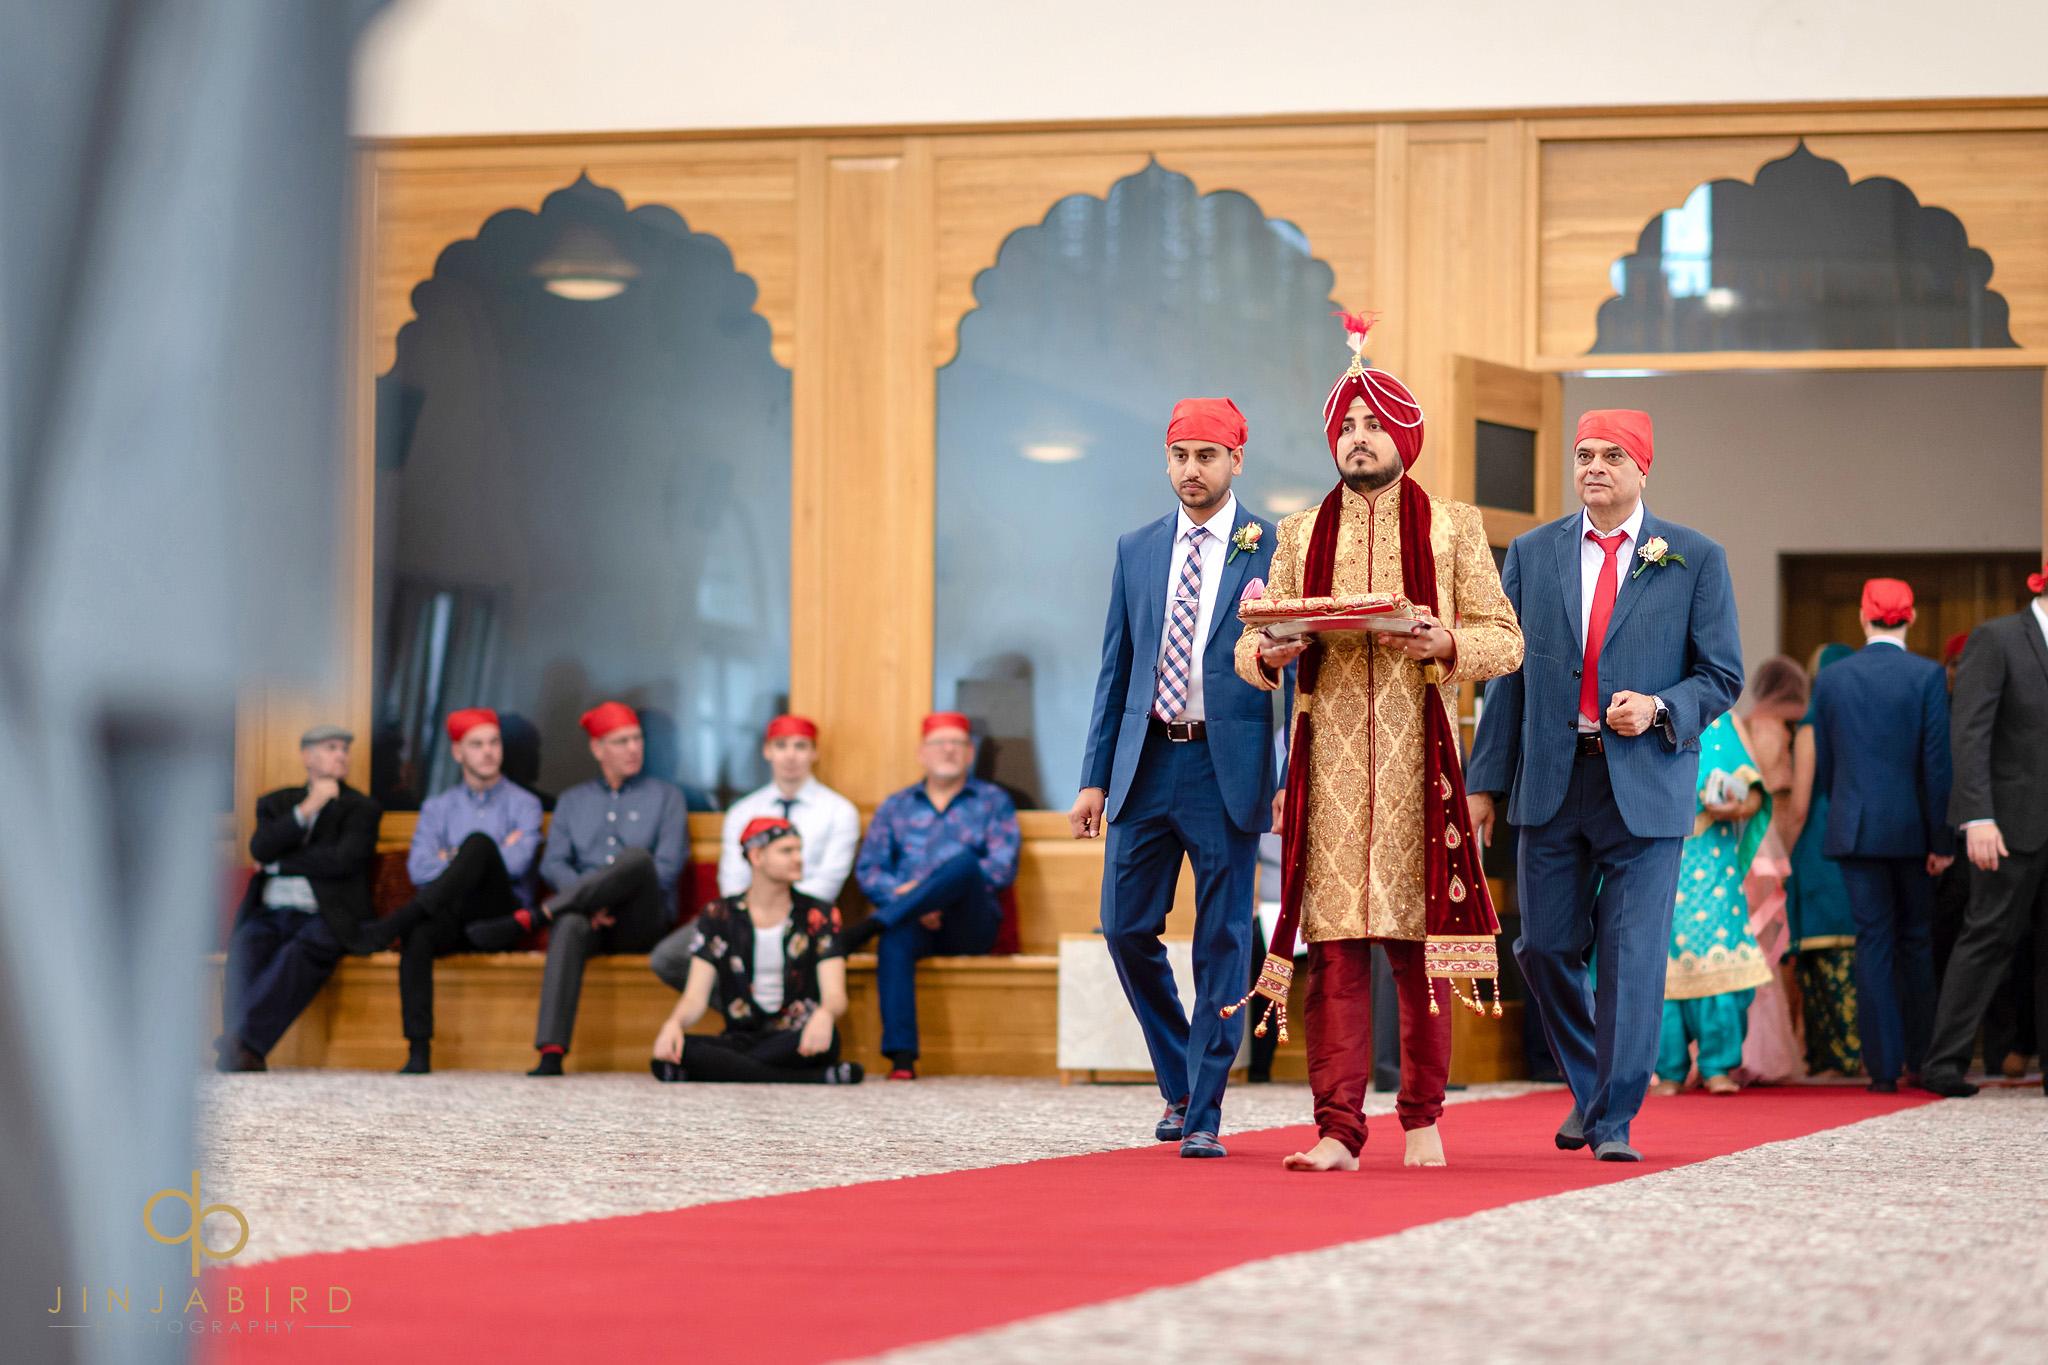 bedford gurdwara wedding ceremony